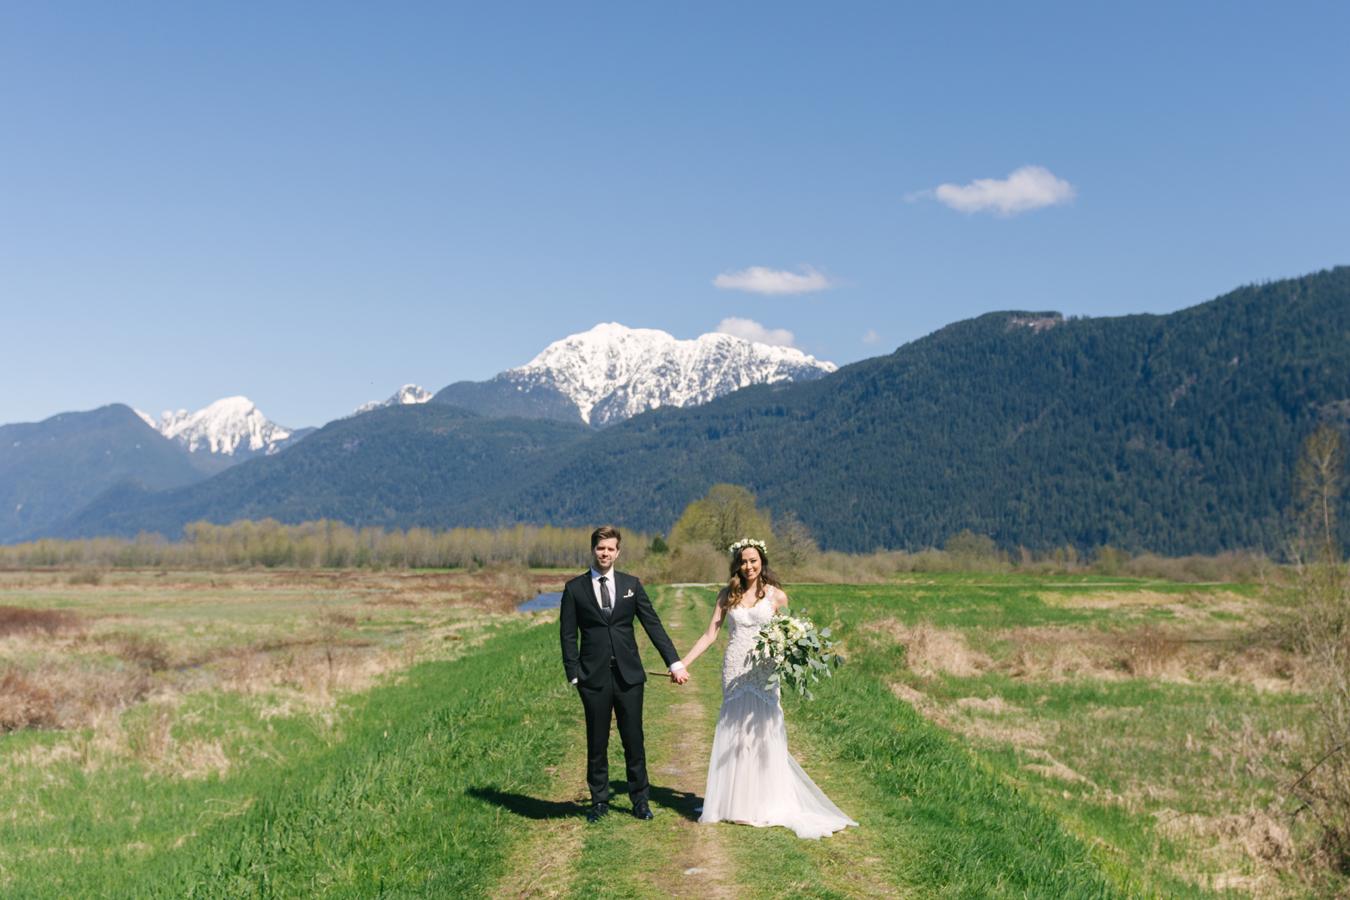 vanouver-wedding-portraits-17.jpg